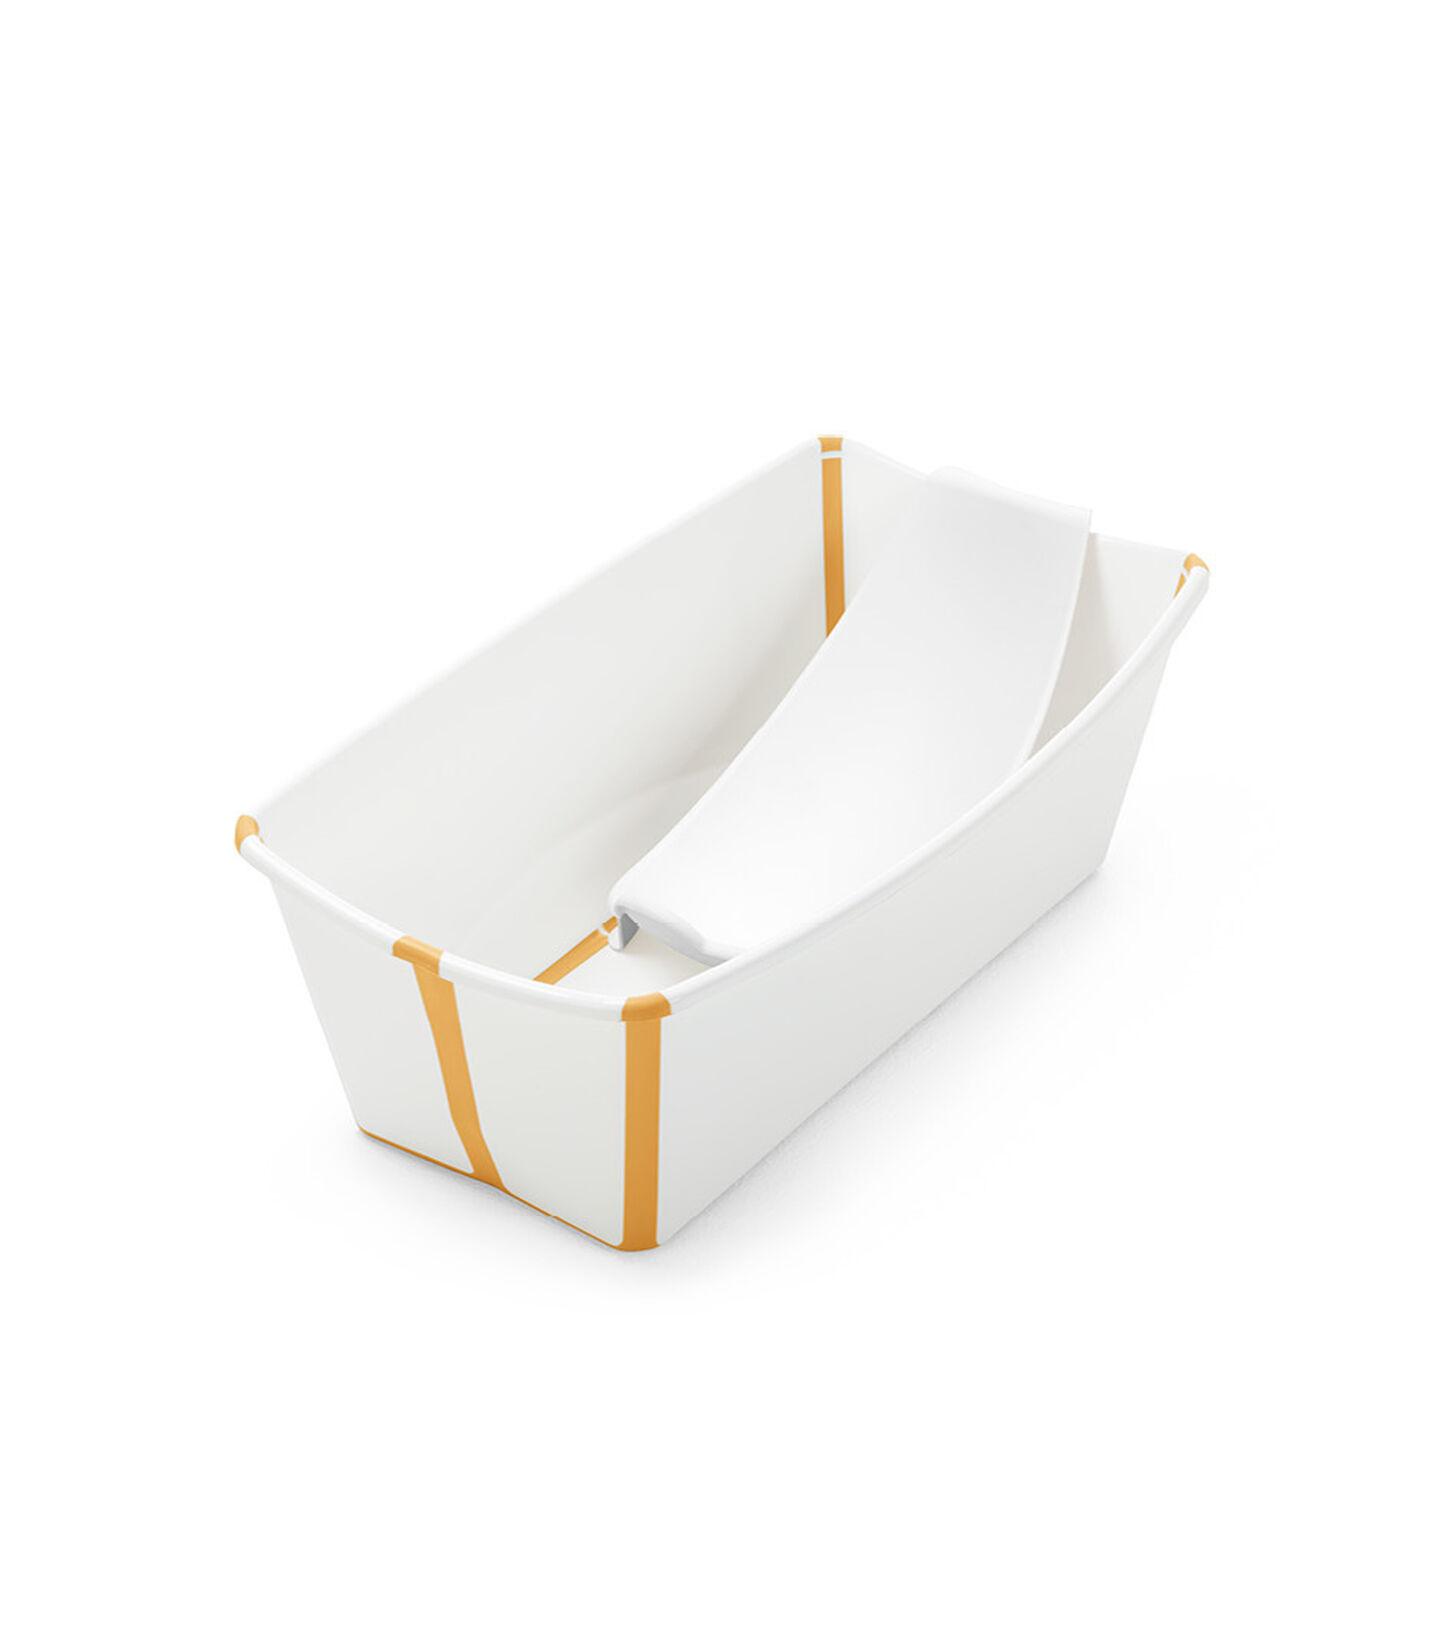 Stokke® Flexi Bath® bath tub, White and Yellow with Newborn insert.